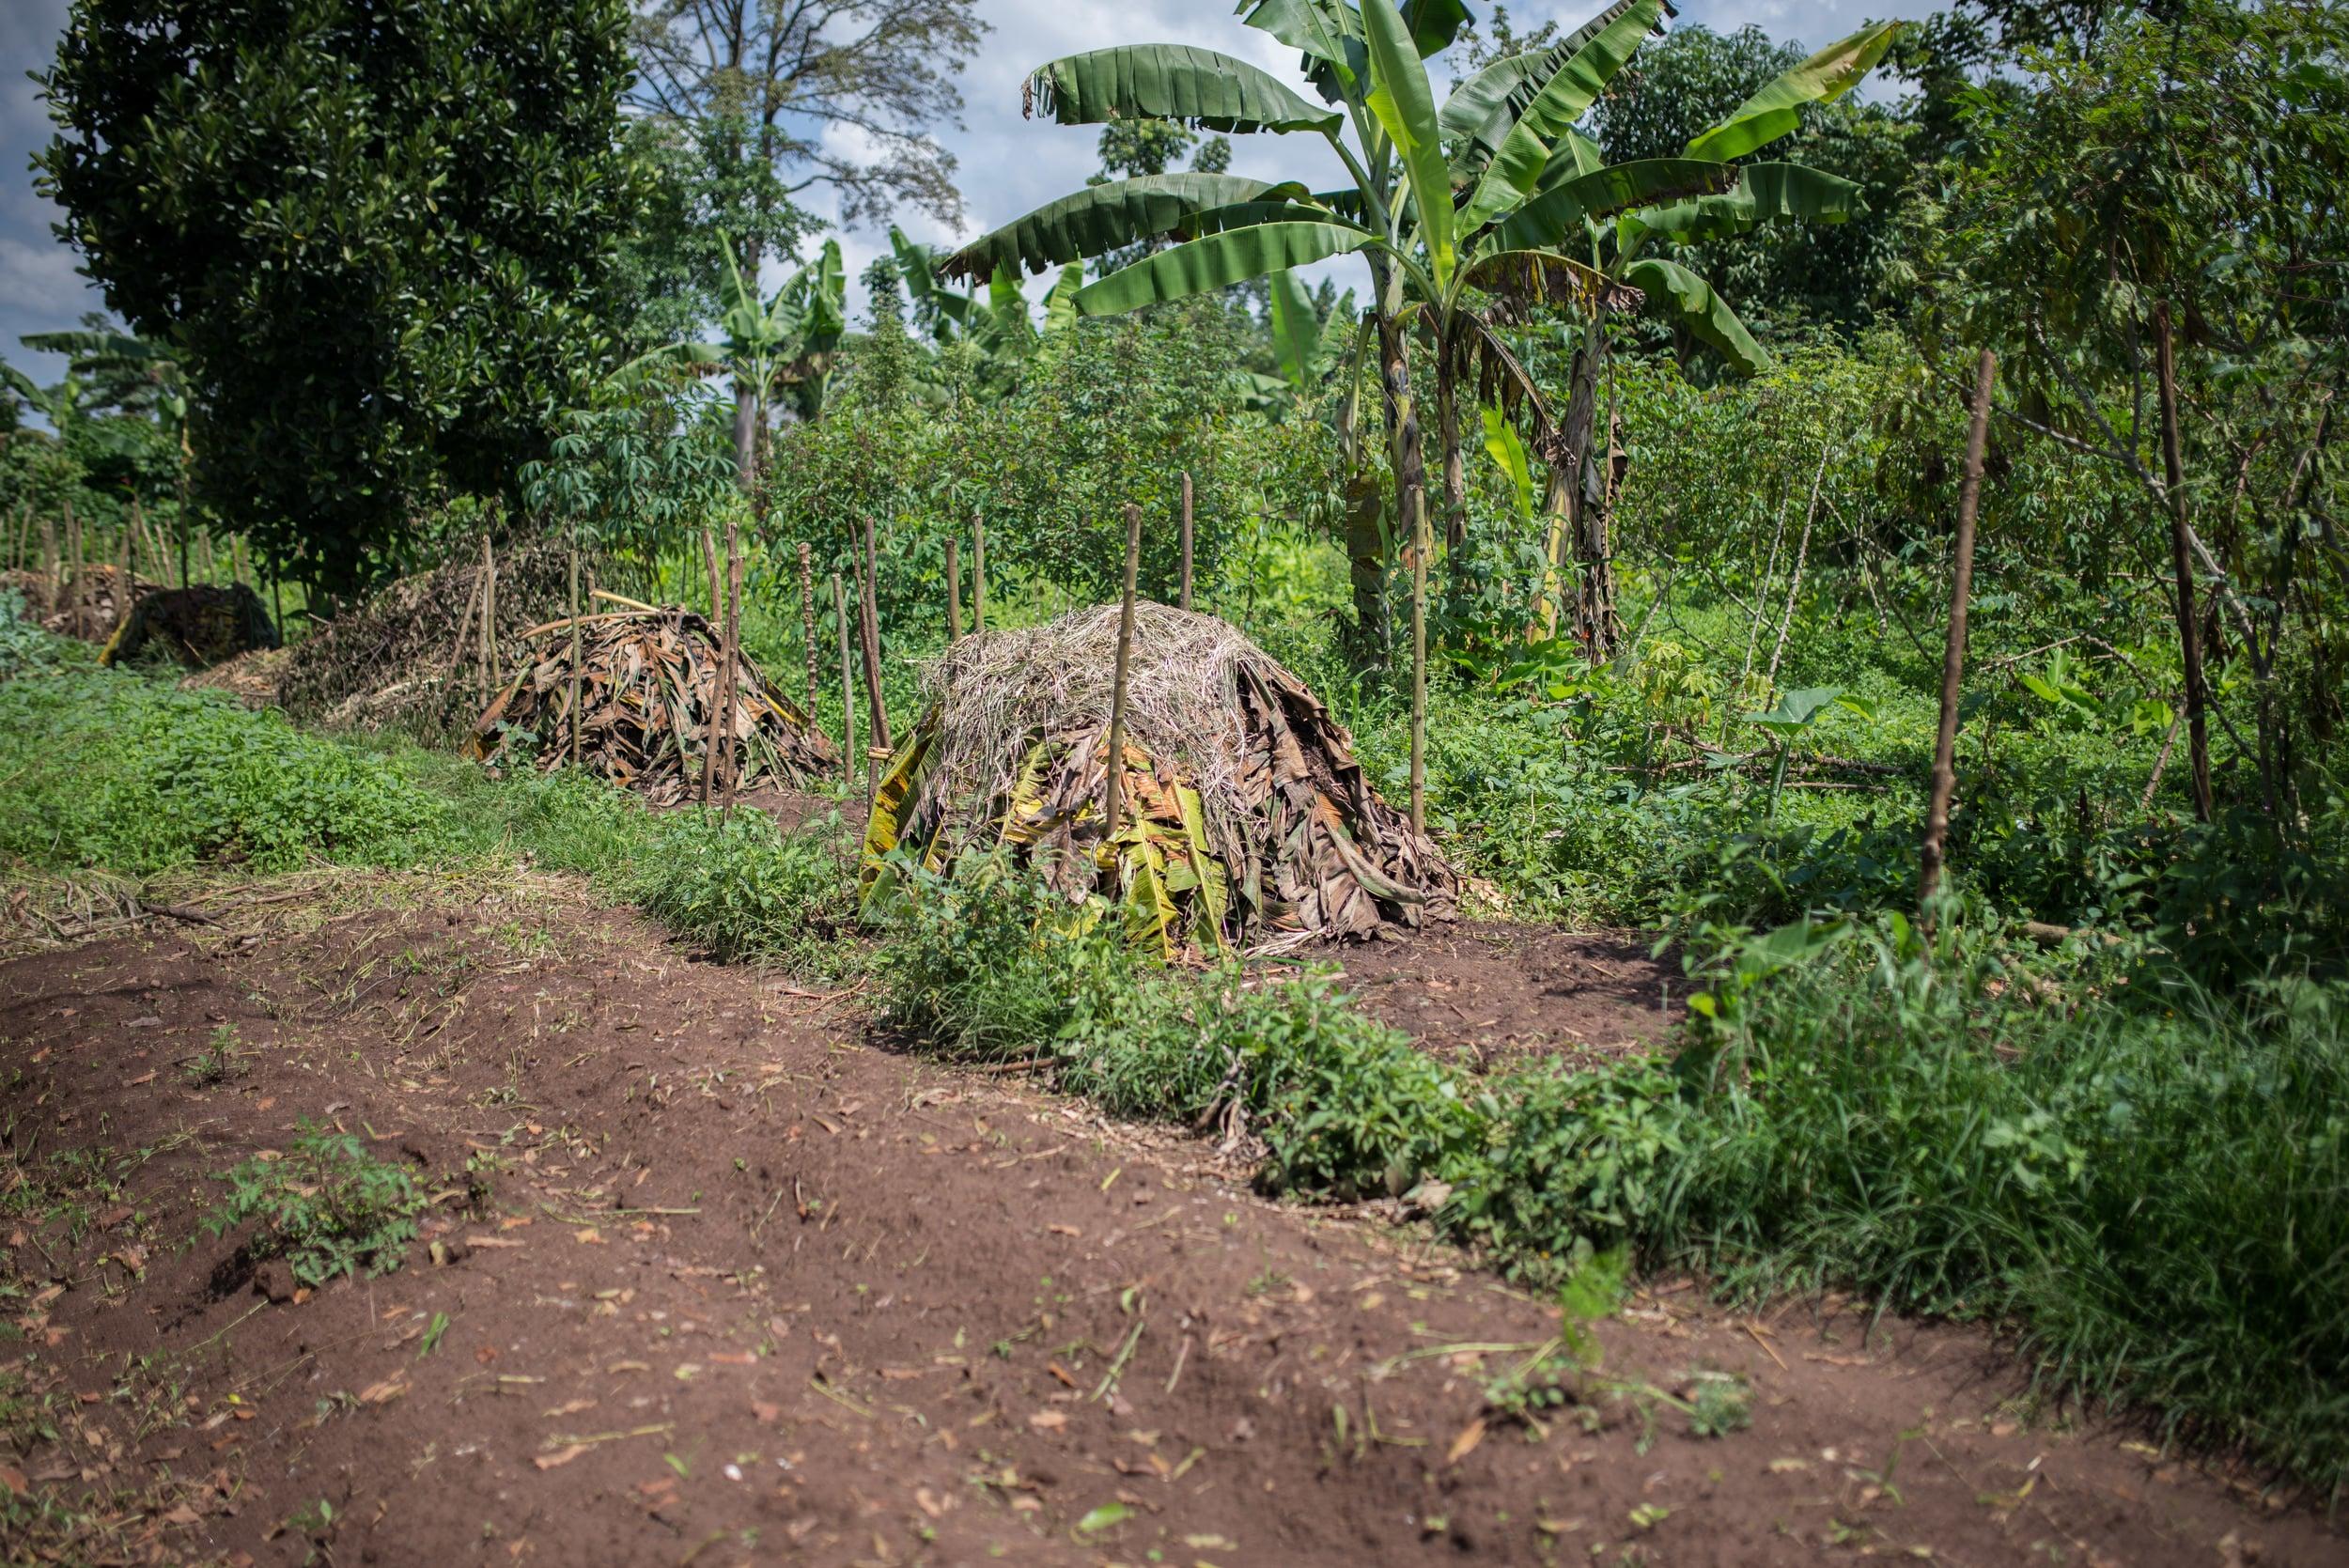 Compost piles in the Uganda garden.